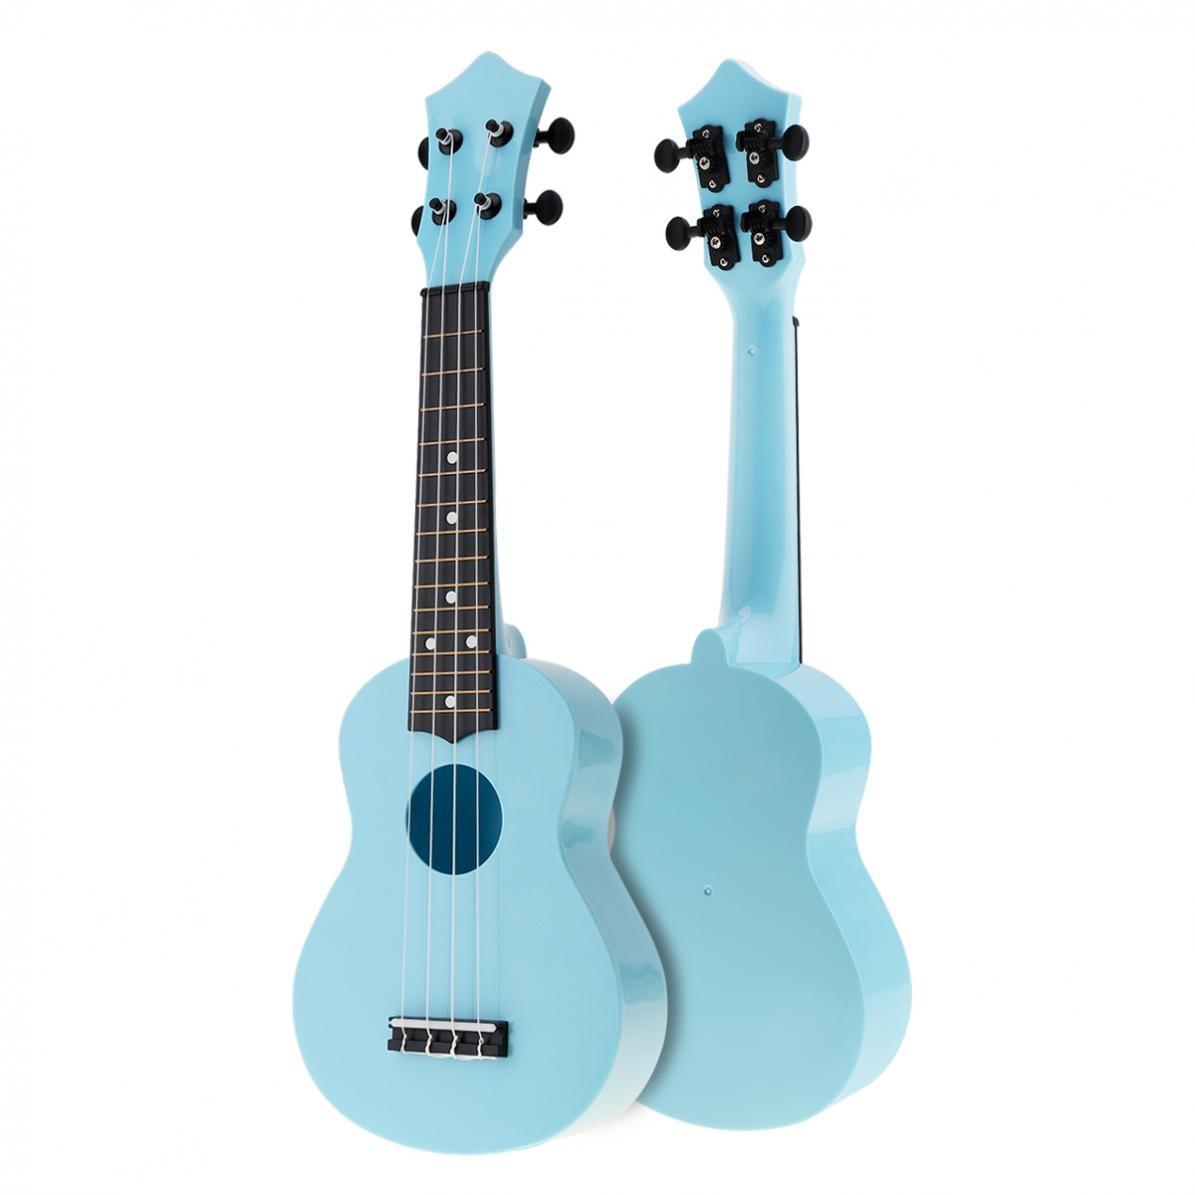 hawaii acoustic ukulele- guitarmetrics